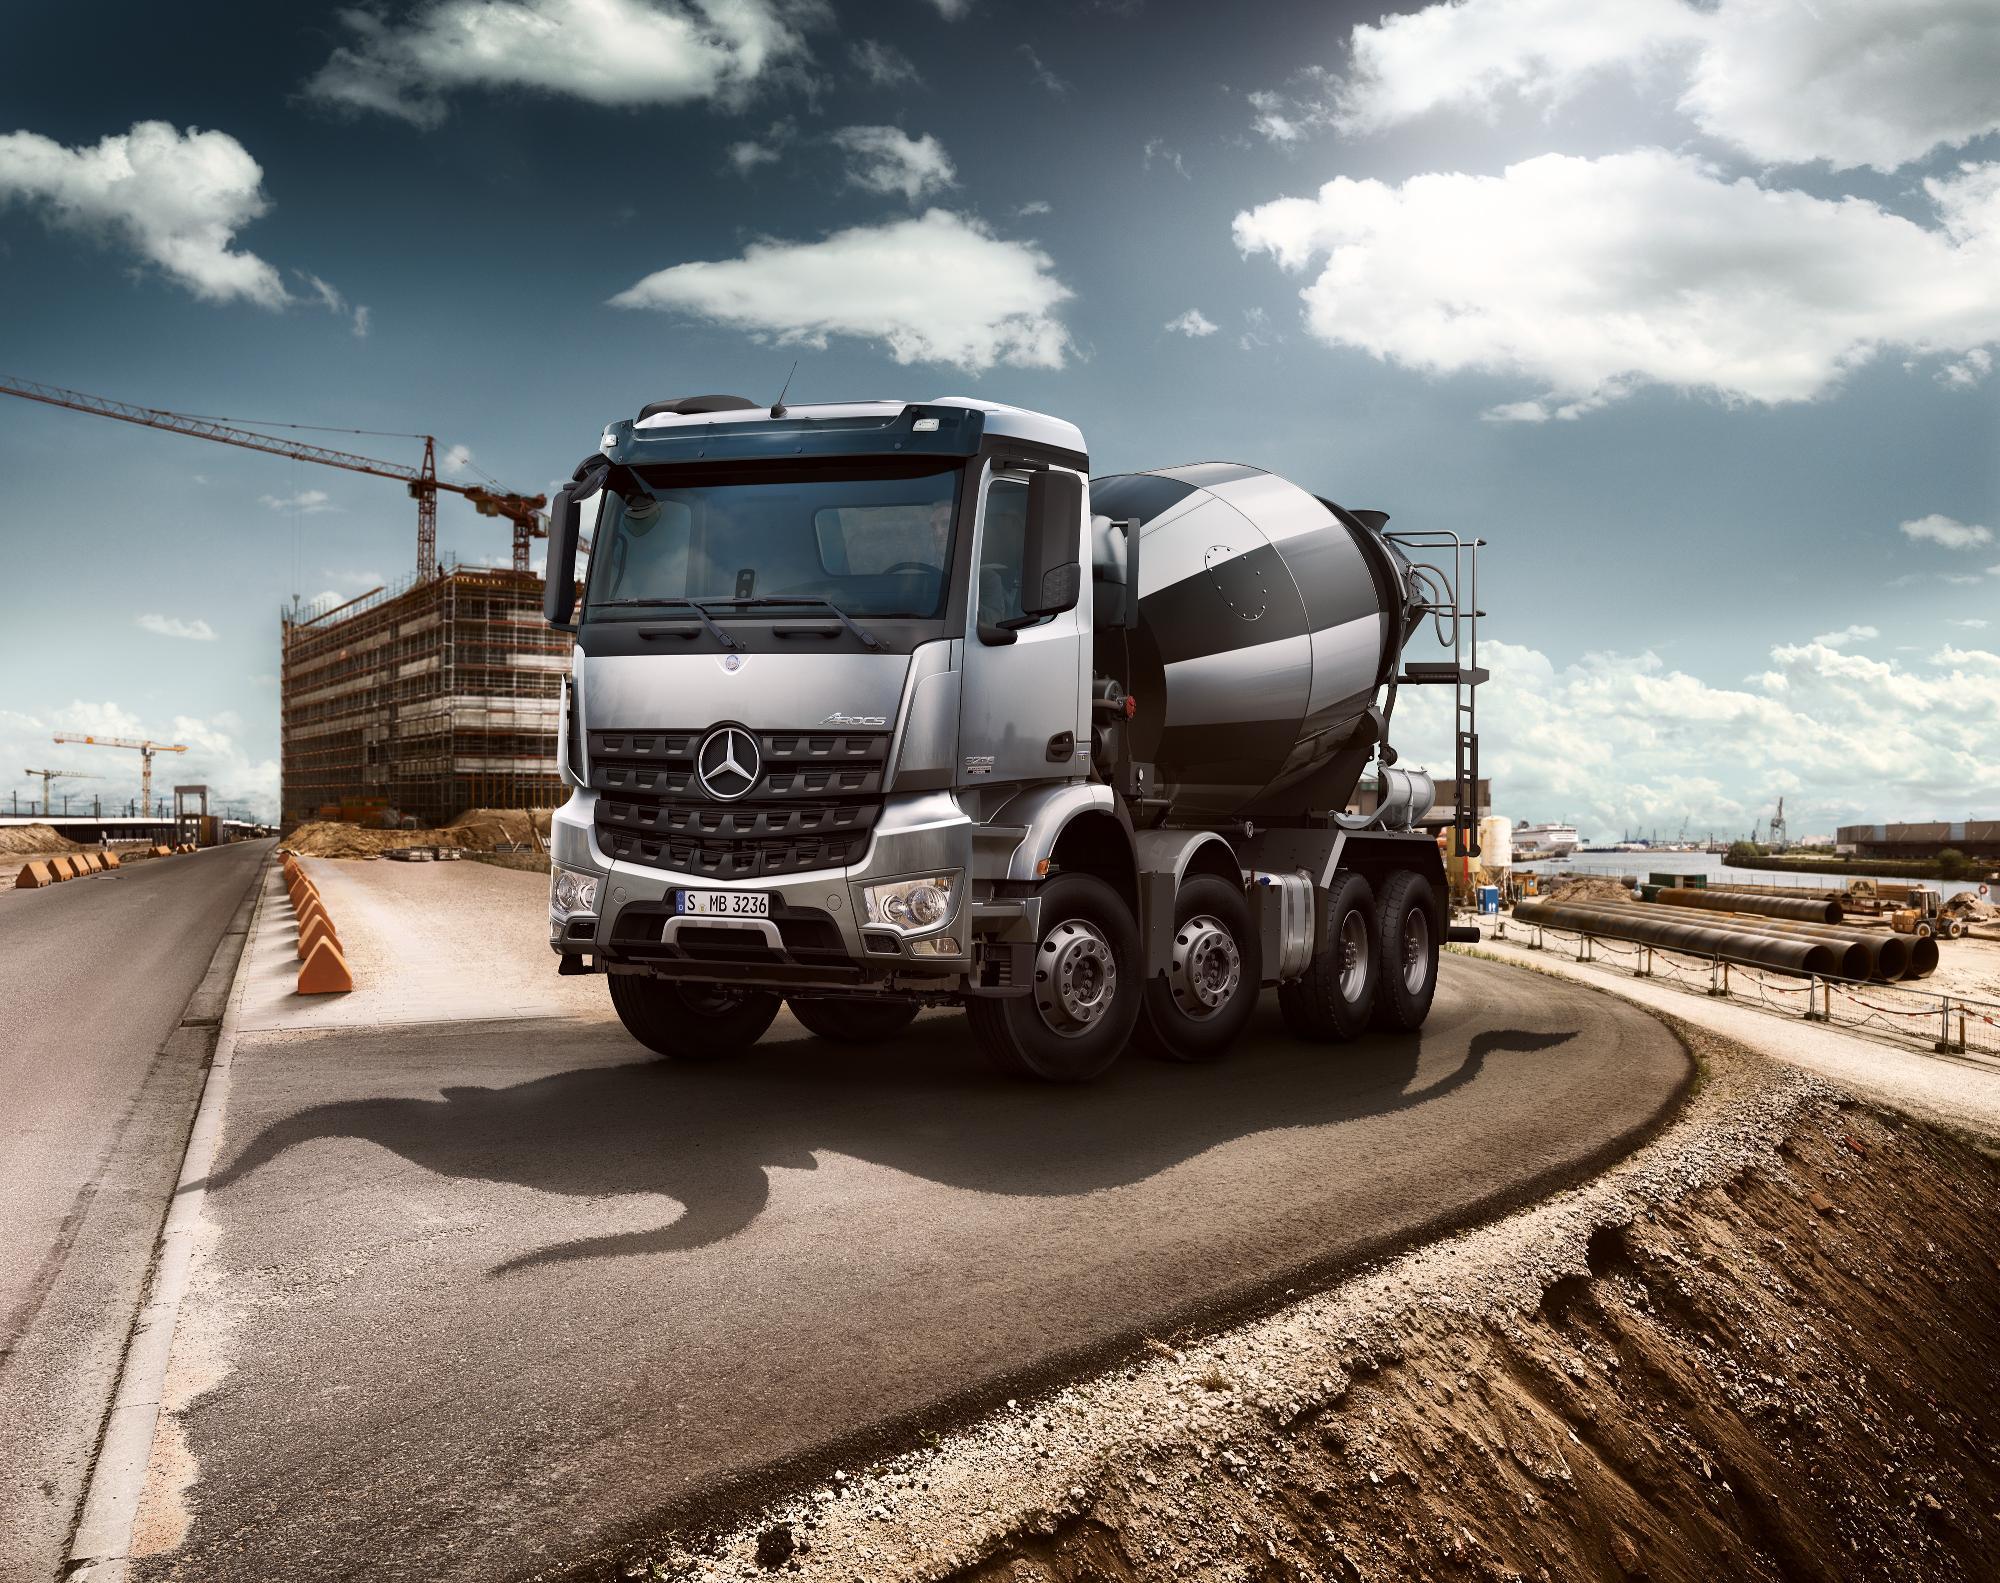 Ford Truck Hd Wallpaper Mercedes Benz Launches Arocs Truck Range Video